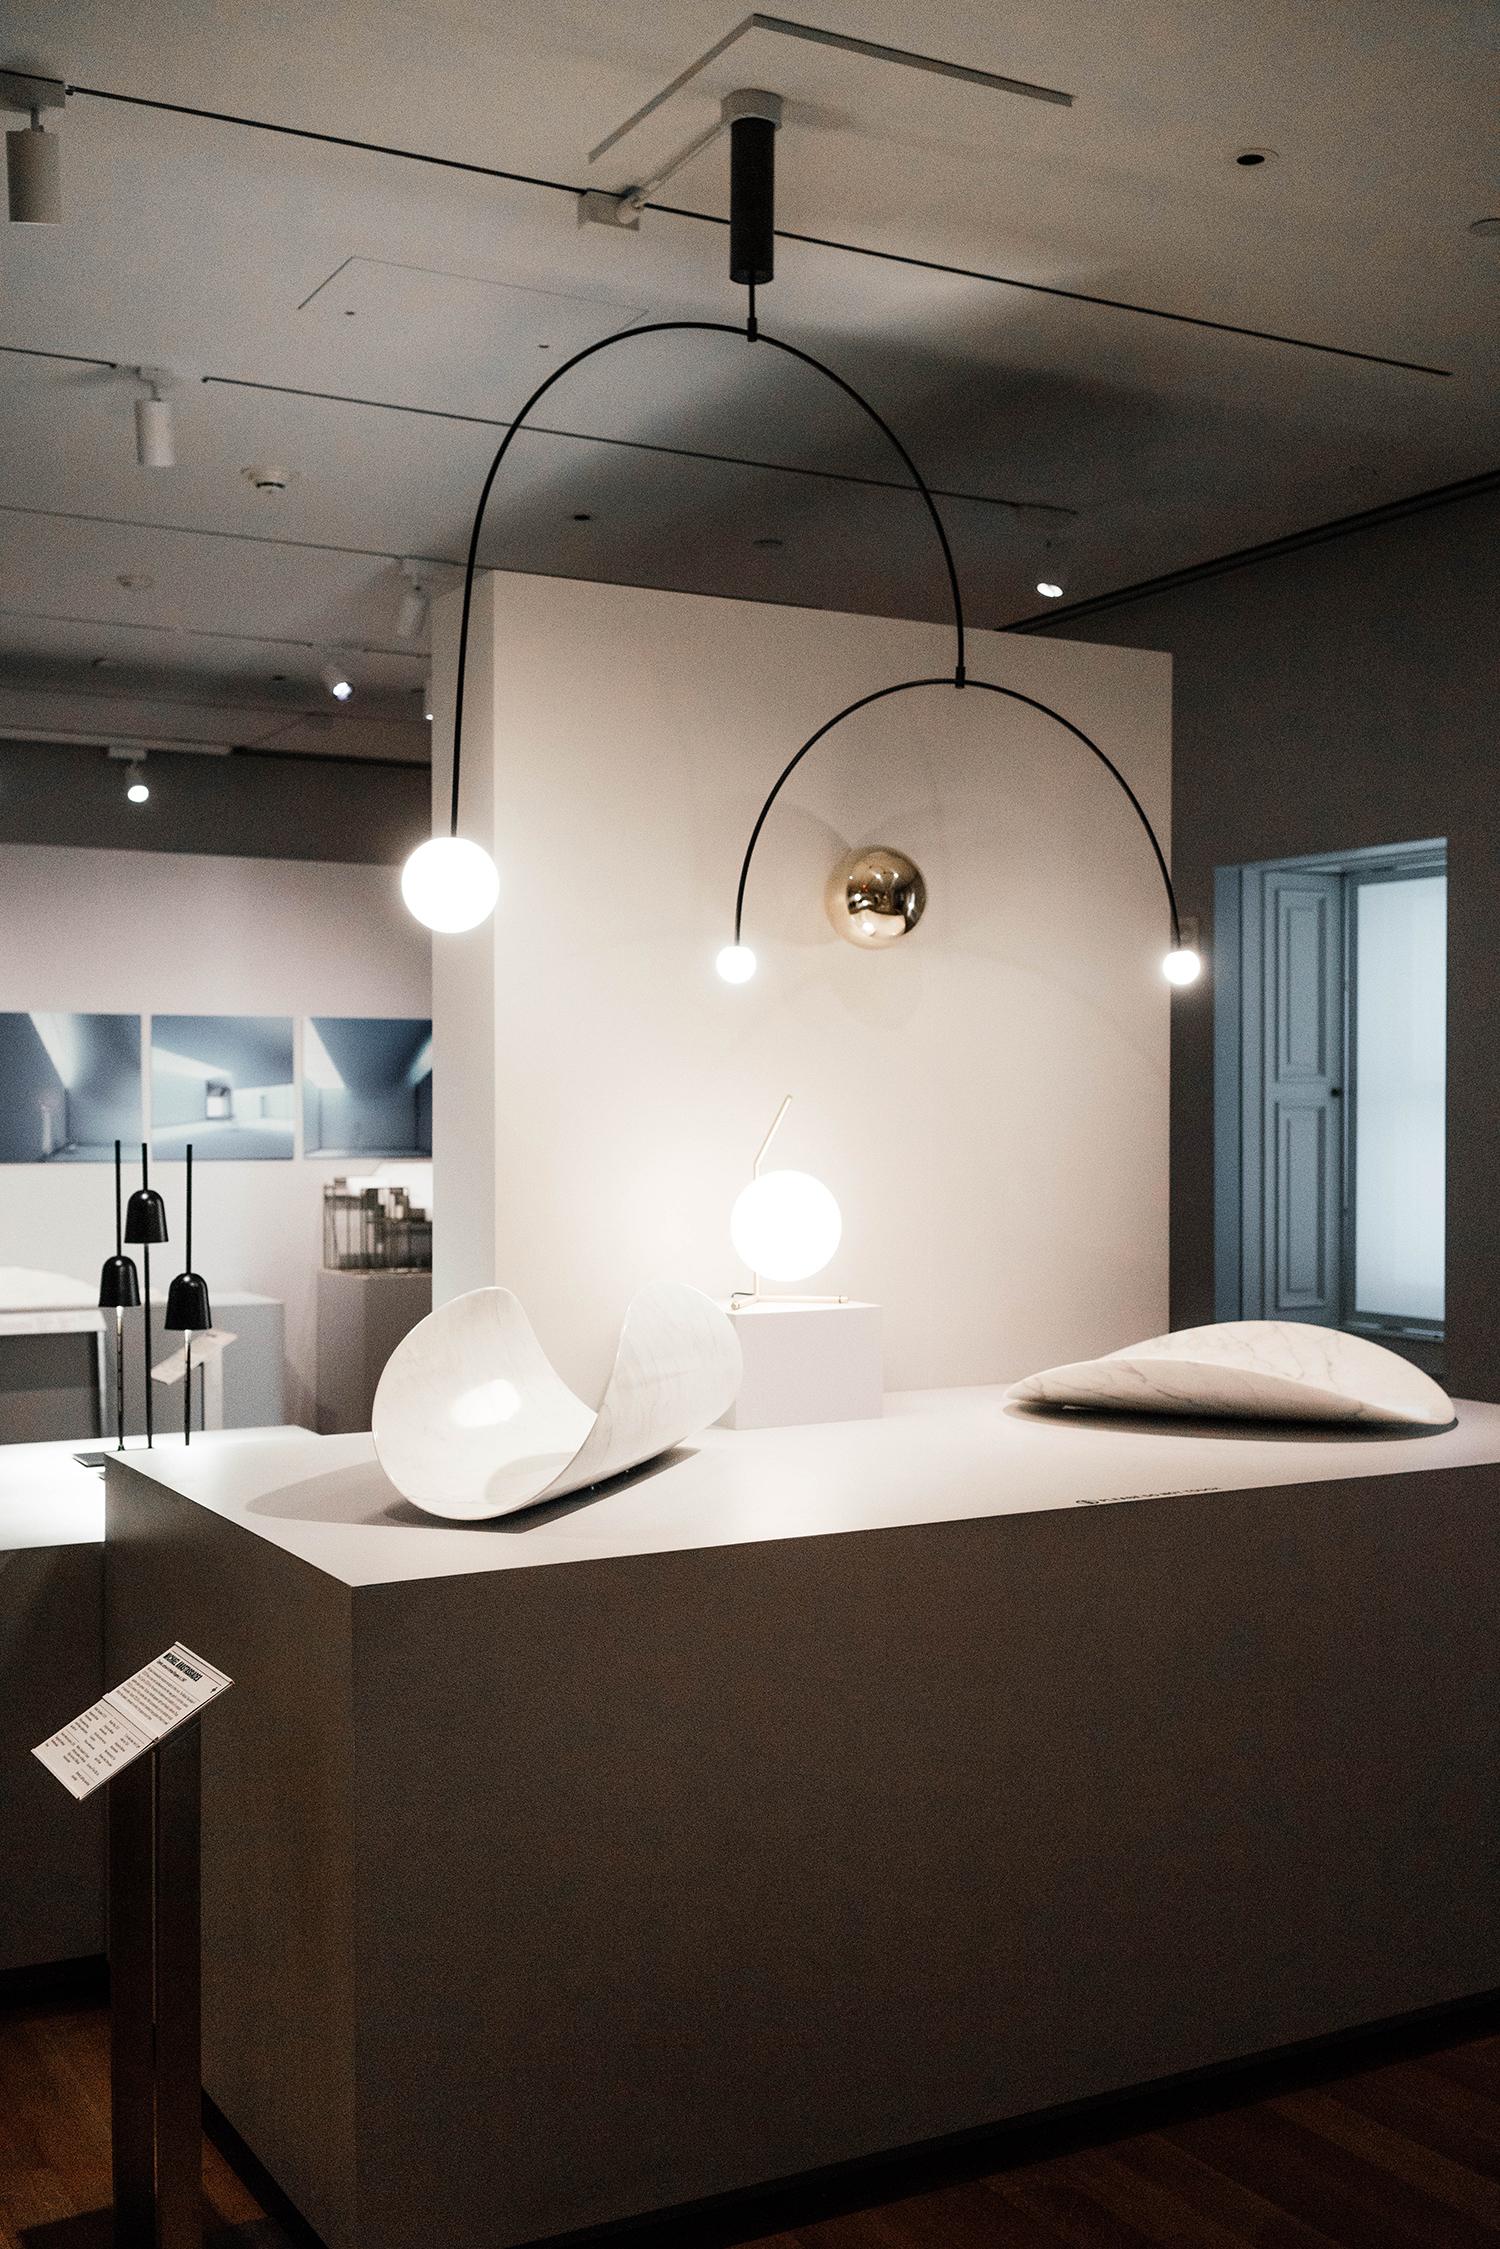 Cooper Hewitt Design Triennial Exhibition  'Beauty' on view February 2 through August 21